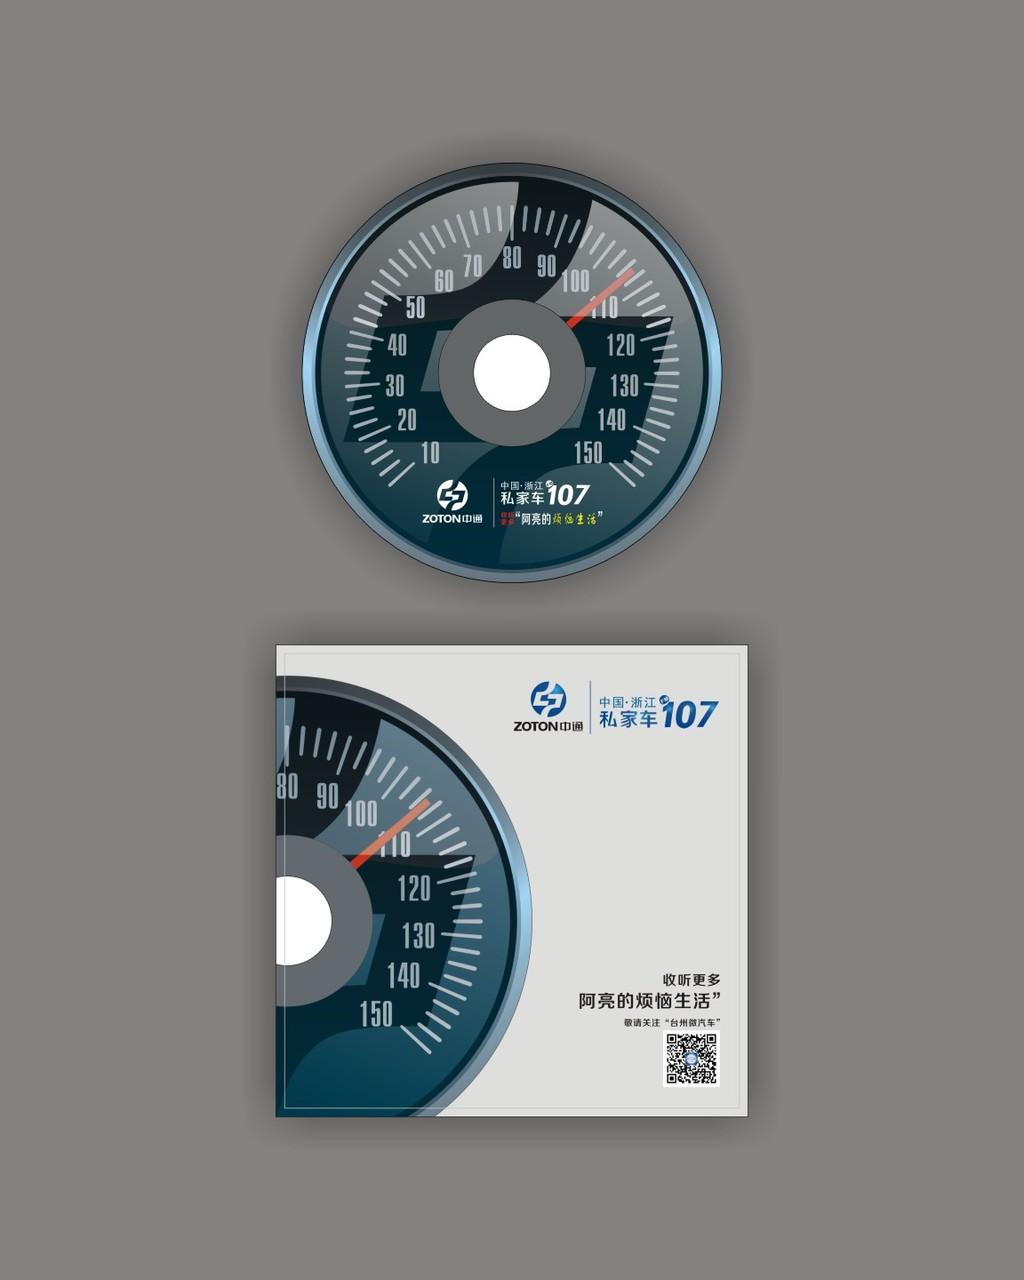 汽车cd设计cd封套设计模板下载 汽车cd设计cd封套设计图片下载 汽车cd